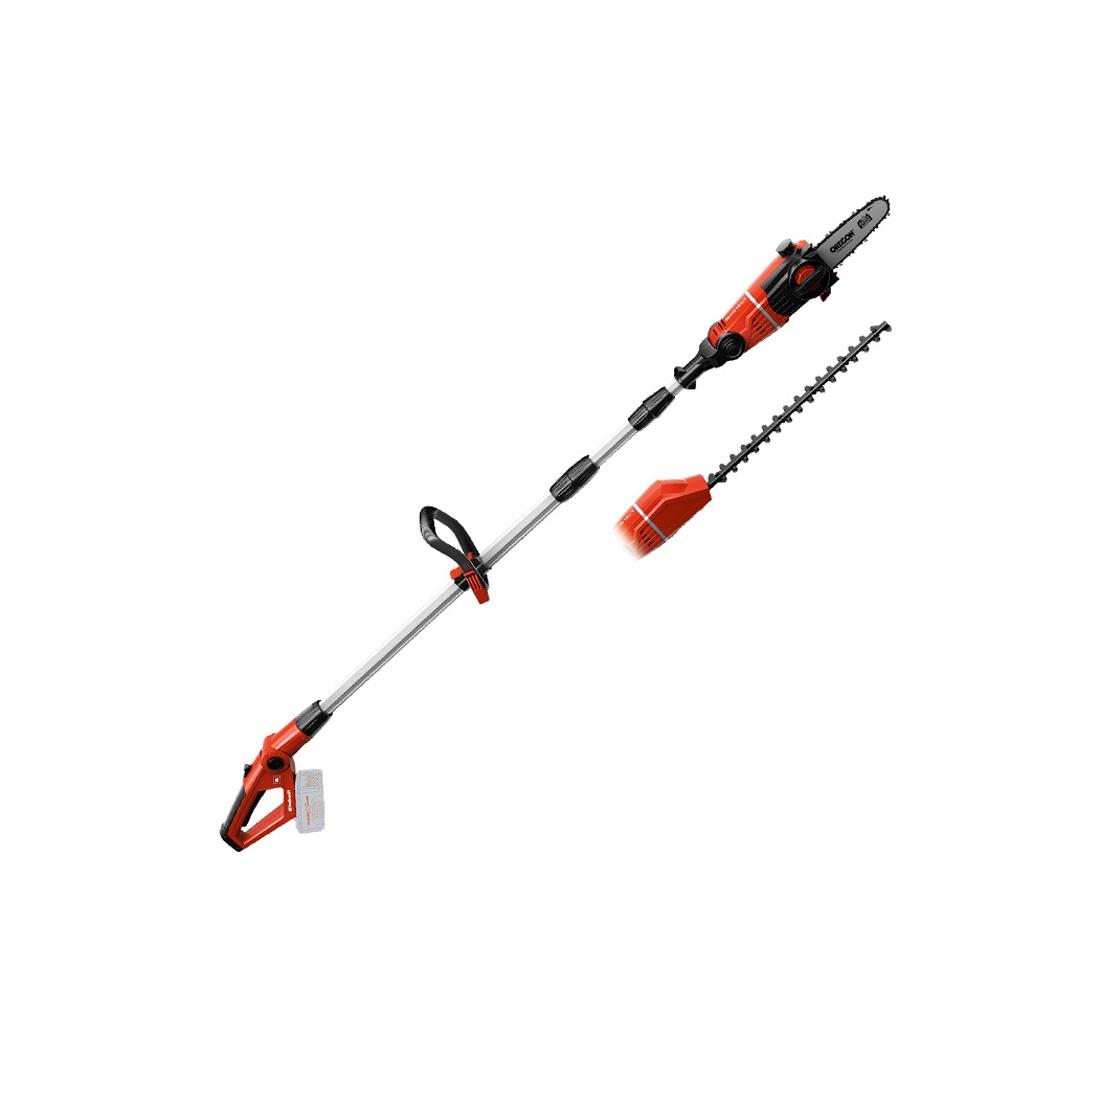 Einhell GE-HC 18 Li T Solo - Cordless Multifunctional Tool